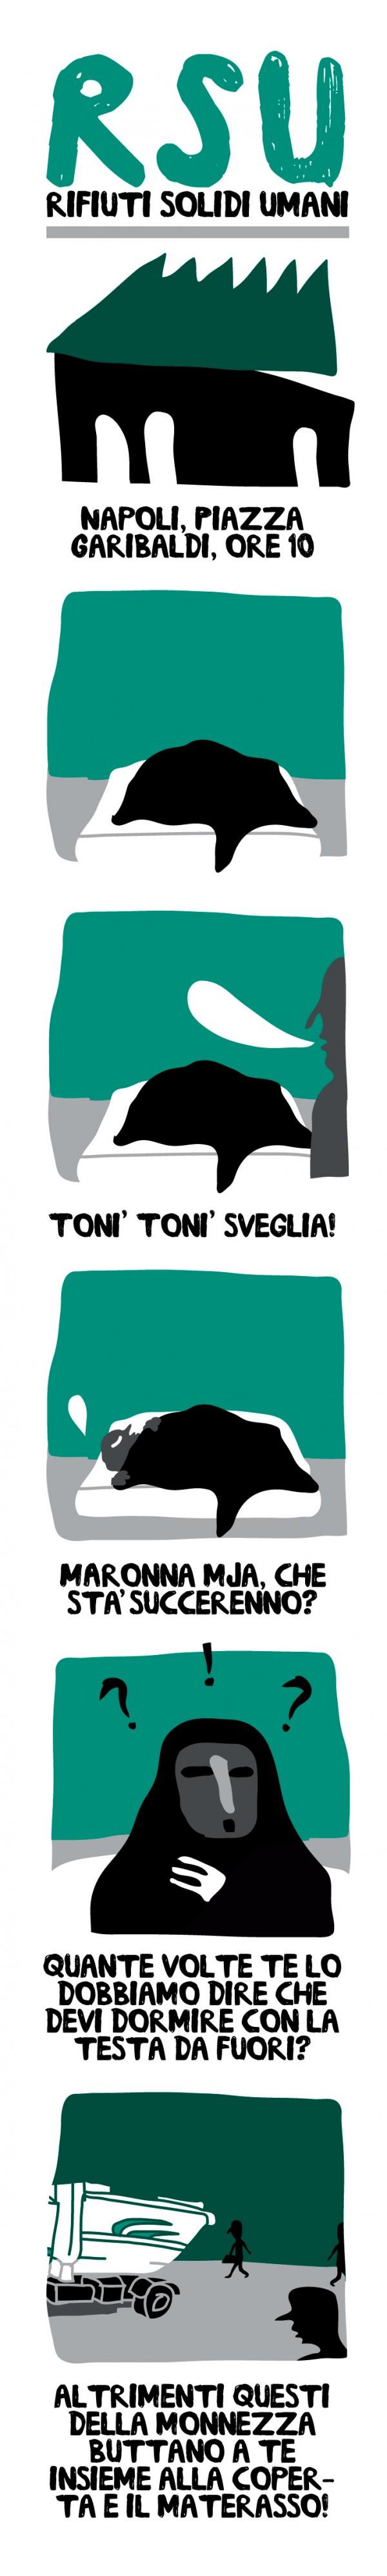 (storia disegnata di cyop&kaf)